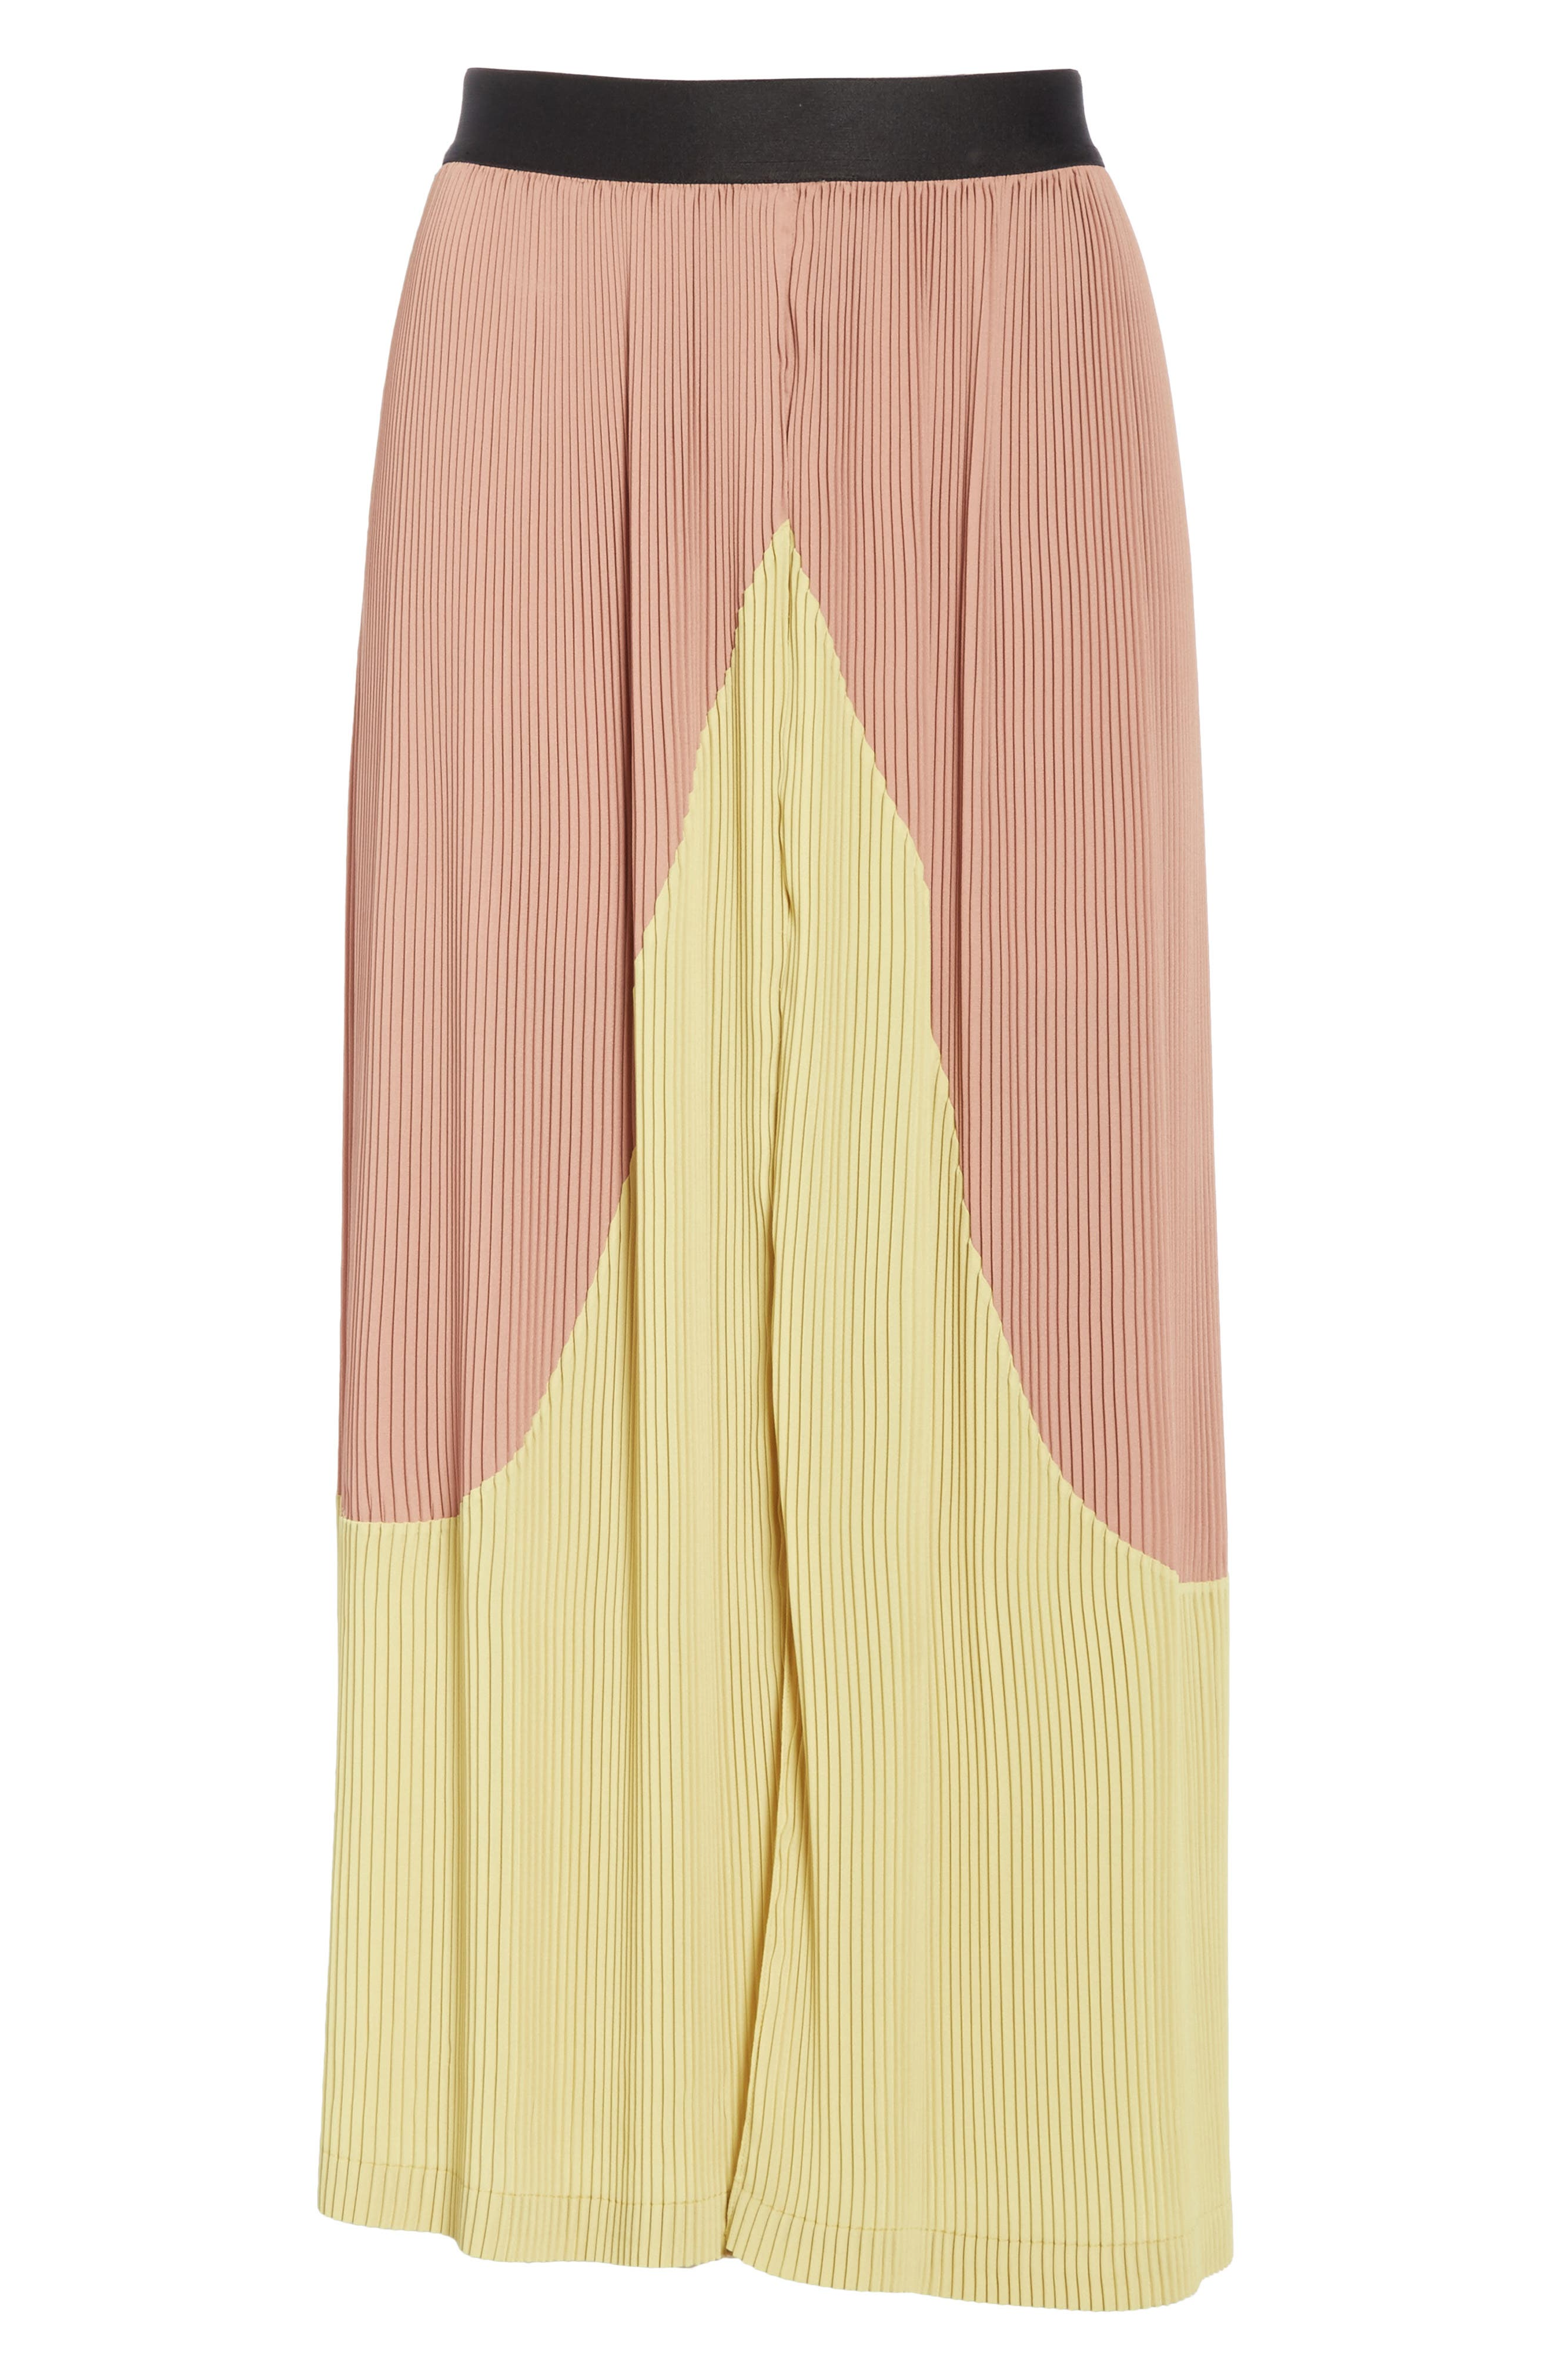 Ballista Midi Skirt,                             Alternate thumbnail 12, color,